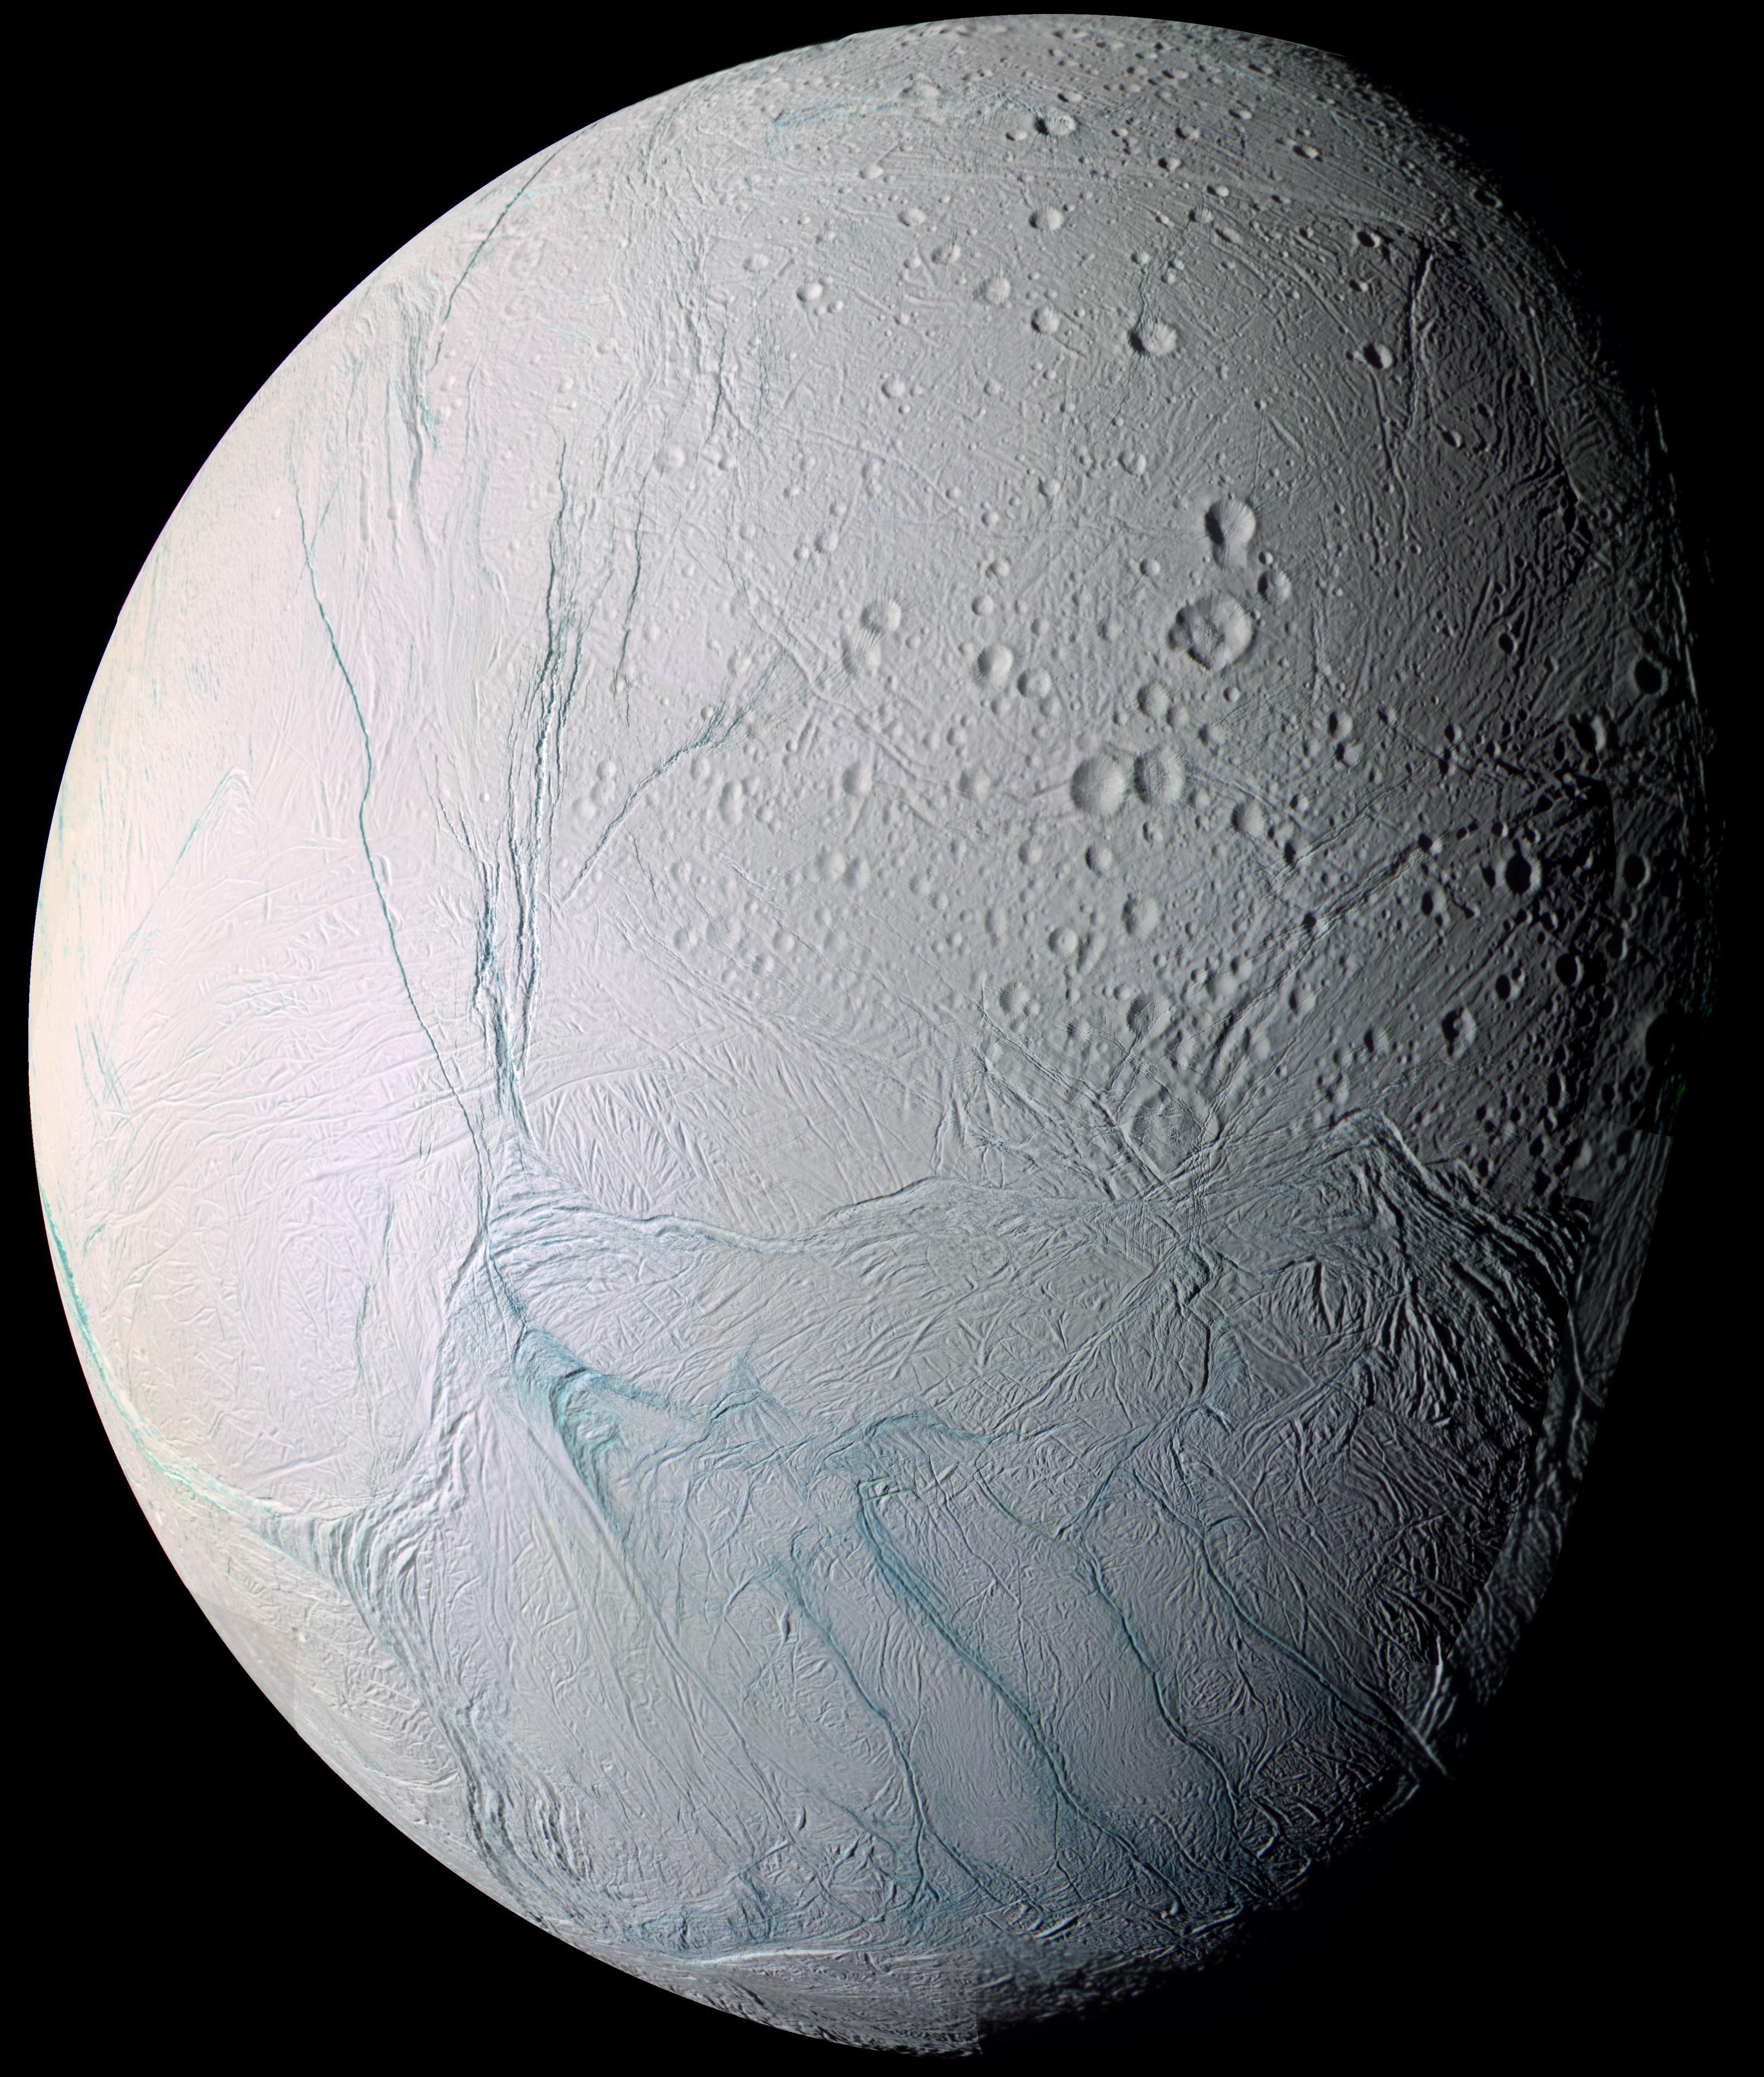 1567216458641-Cassini_Enceladus_mosaic_PIA06254.jpg